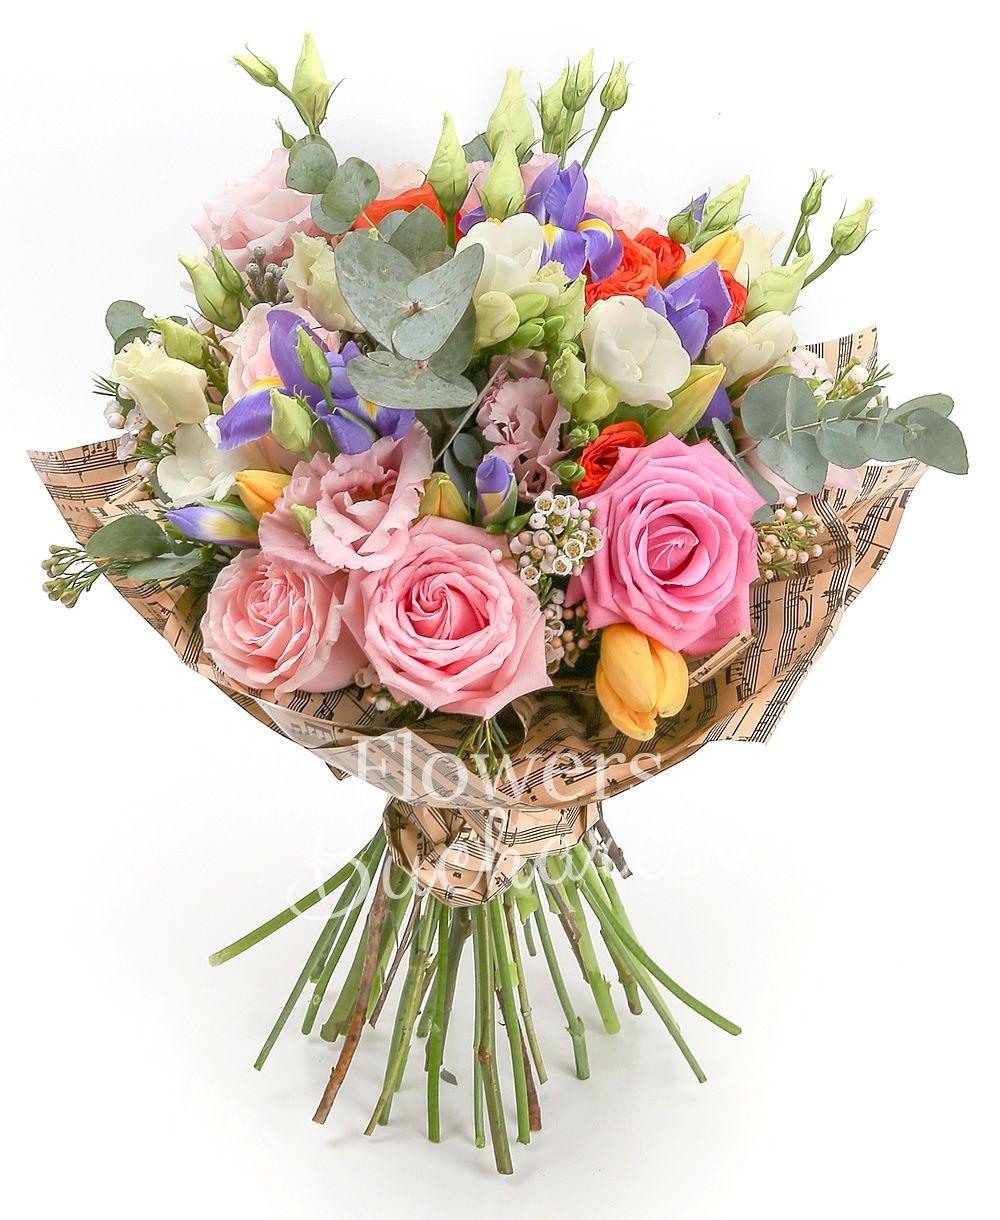 3 pink roses, 5 pink lisianthus, 2 white waxflower, 5 brunia, 5 iris, 3 orange miniroses, 5 yellow tulips, 5 white freesias, greenery